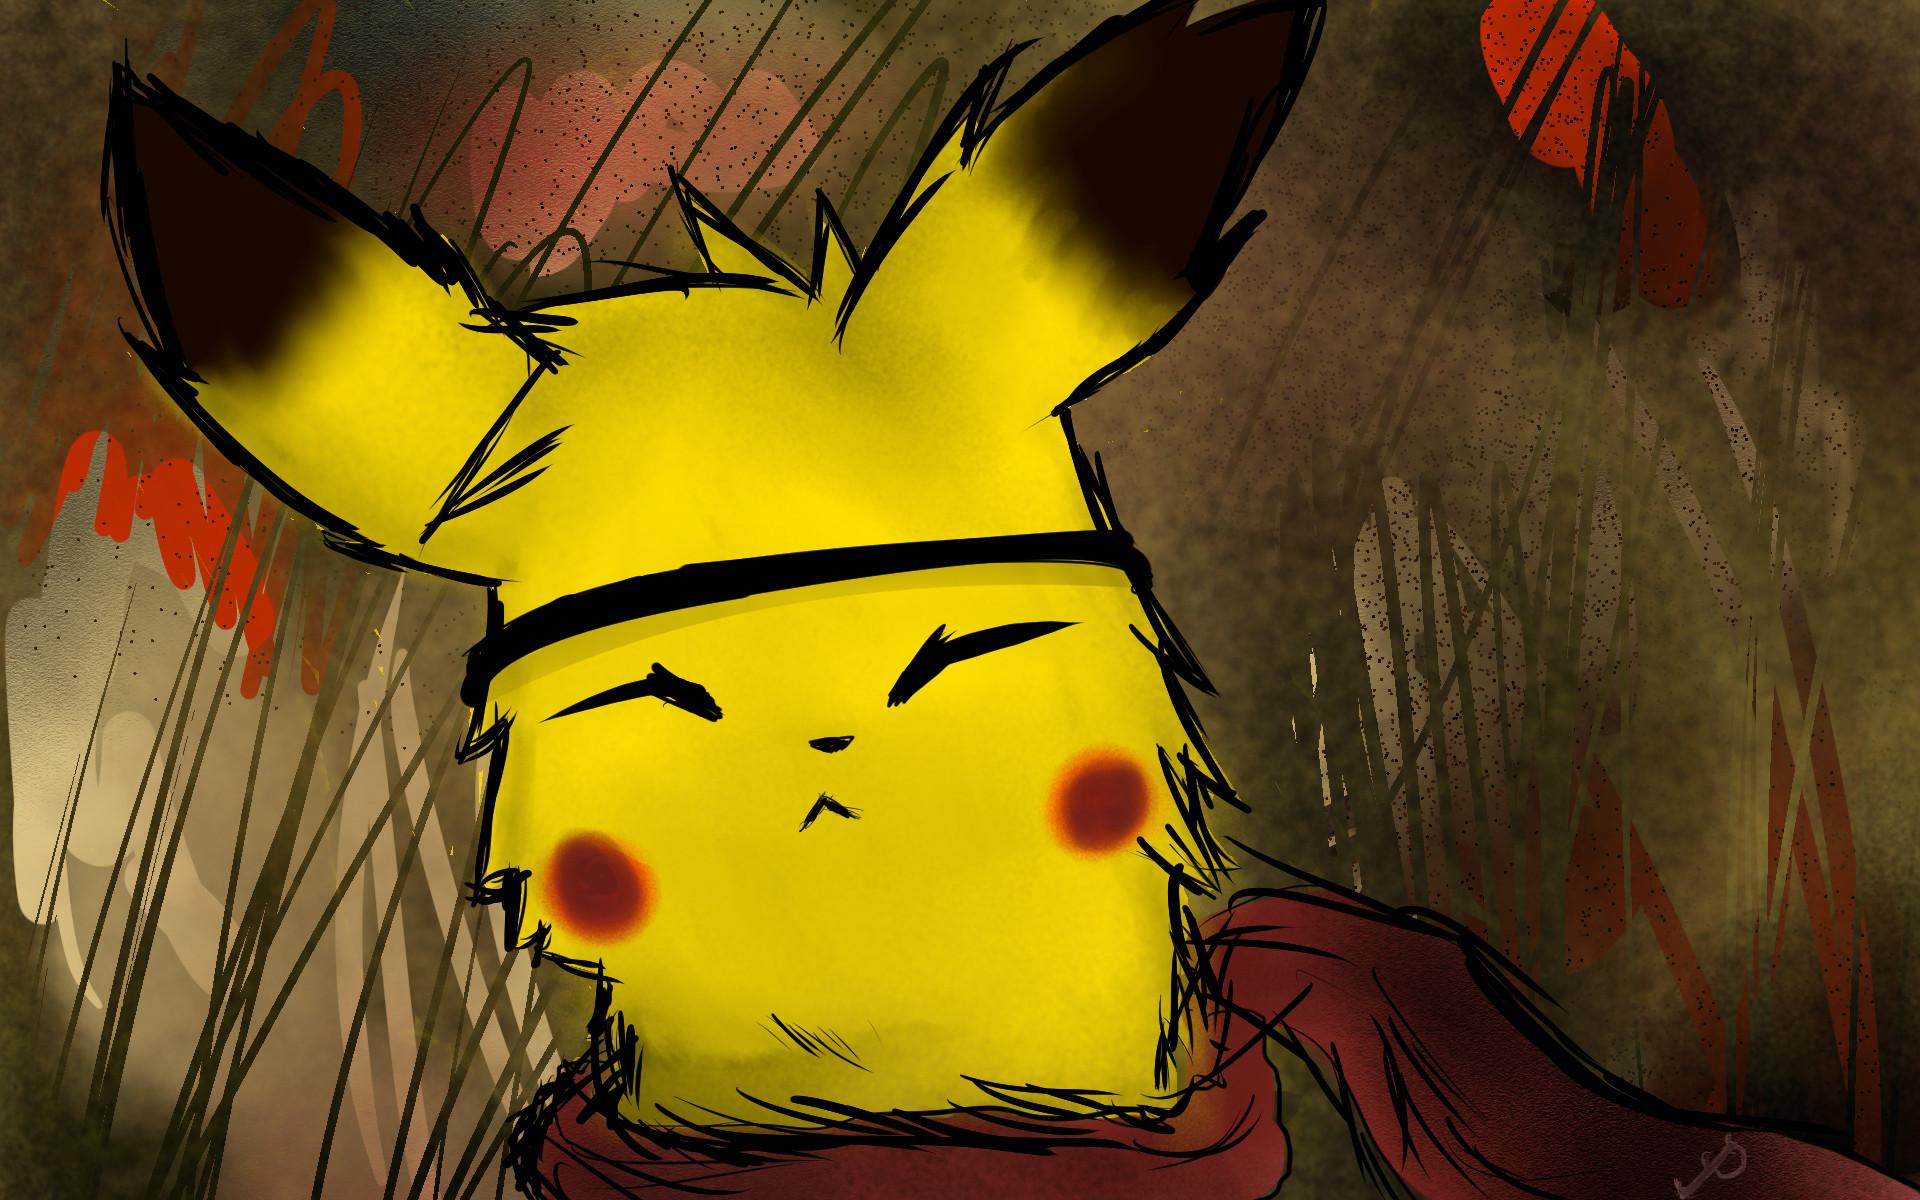 Cute Raichu Wallpaper Pikachu Wallpaper 1920x1080 82 Images